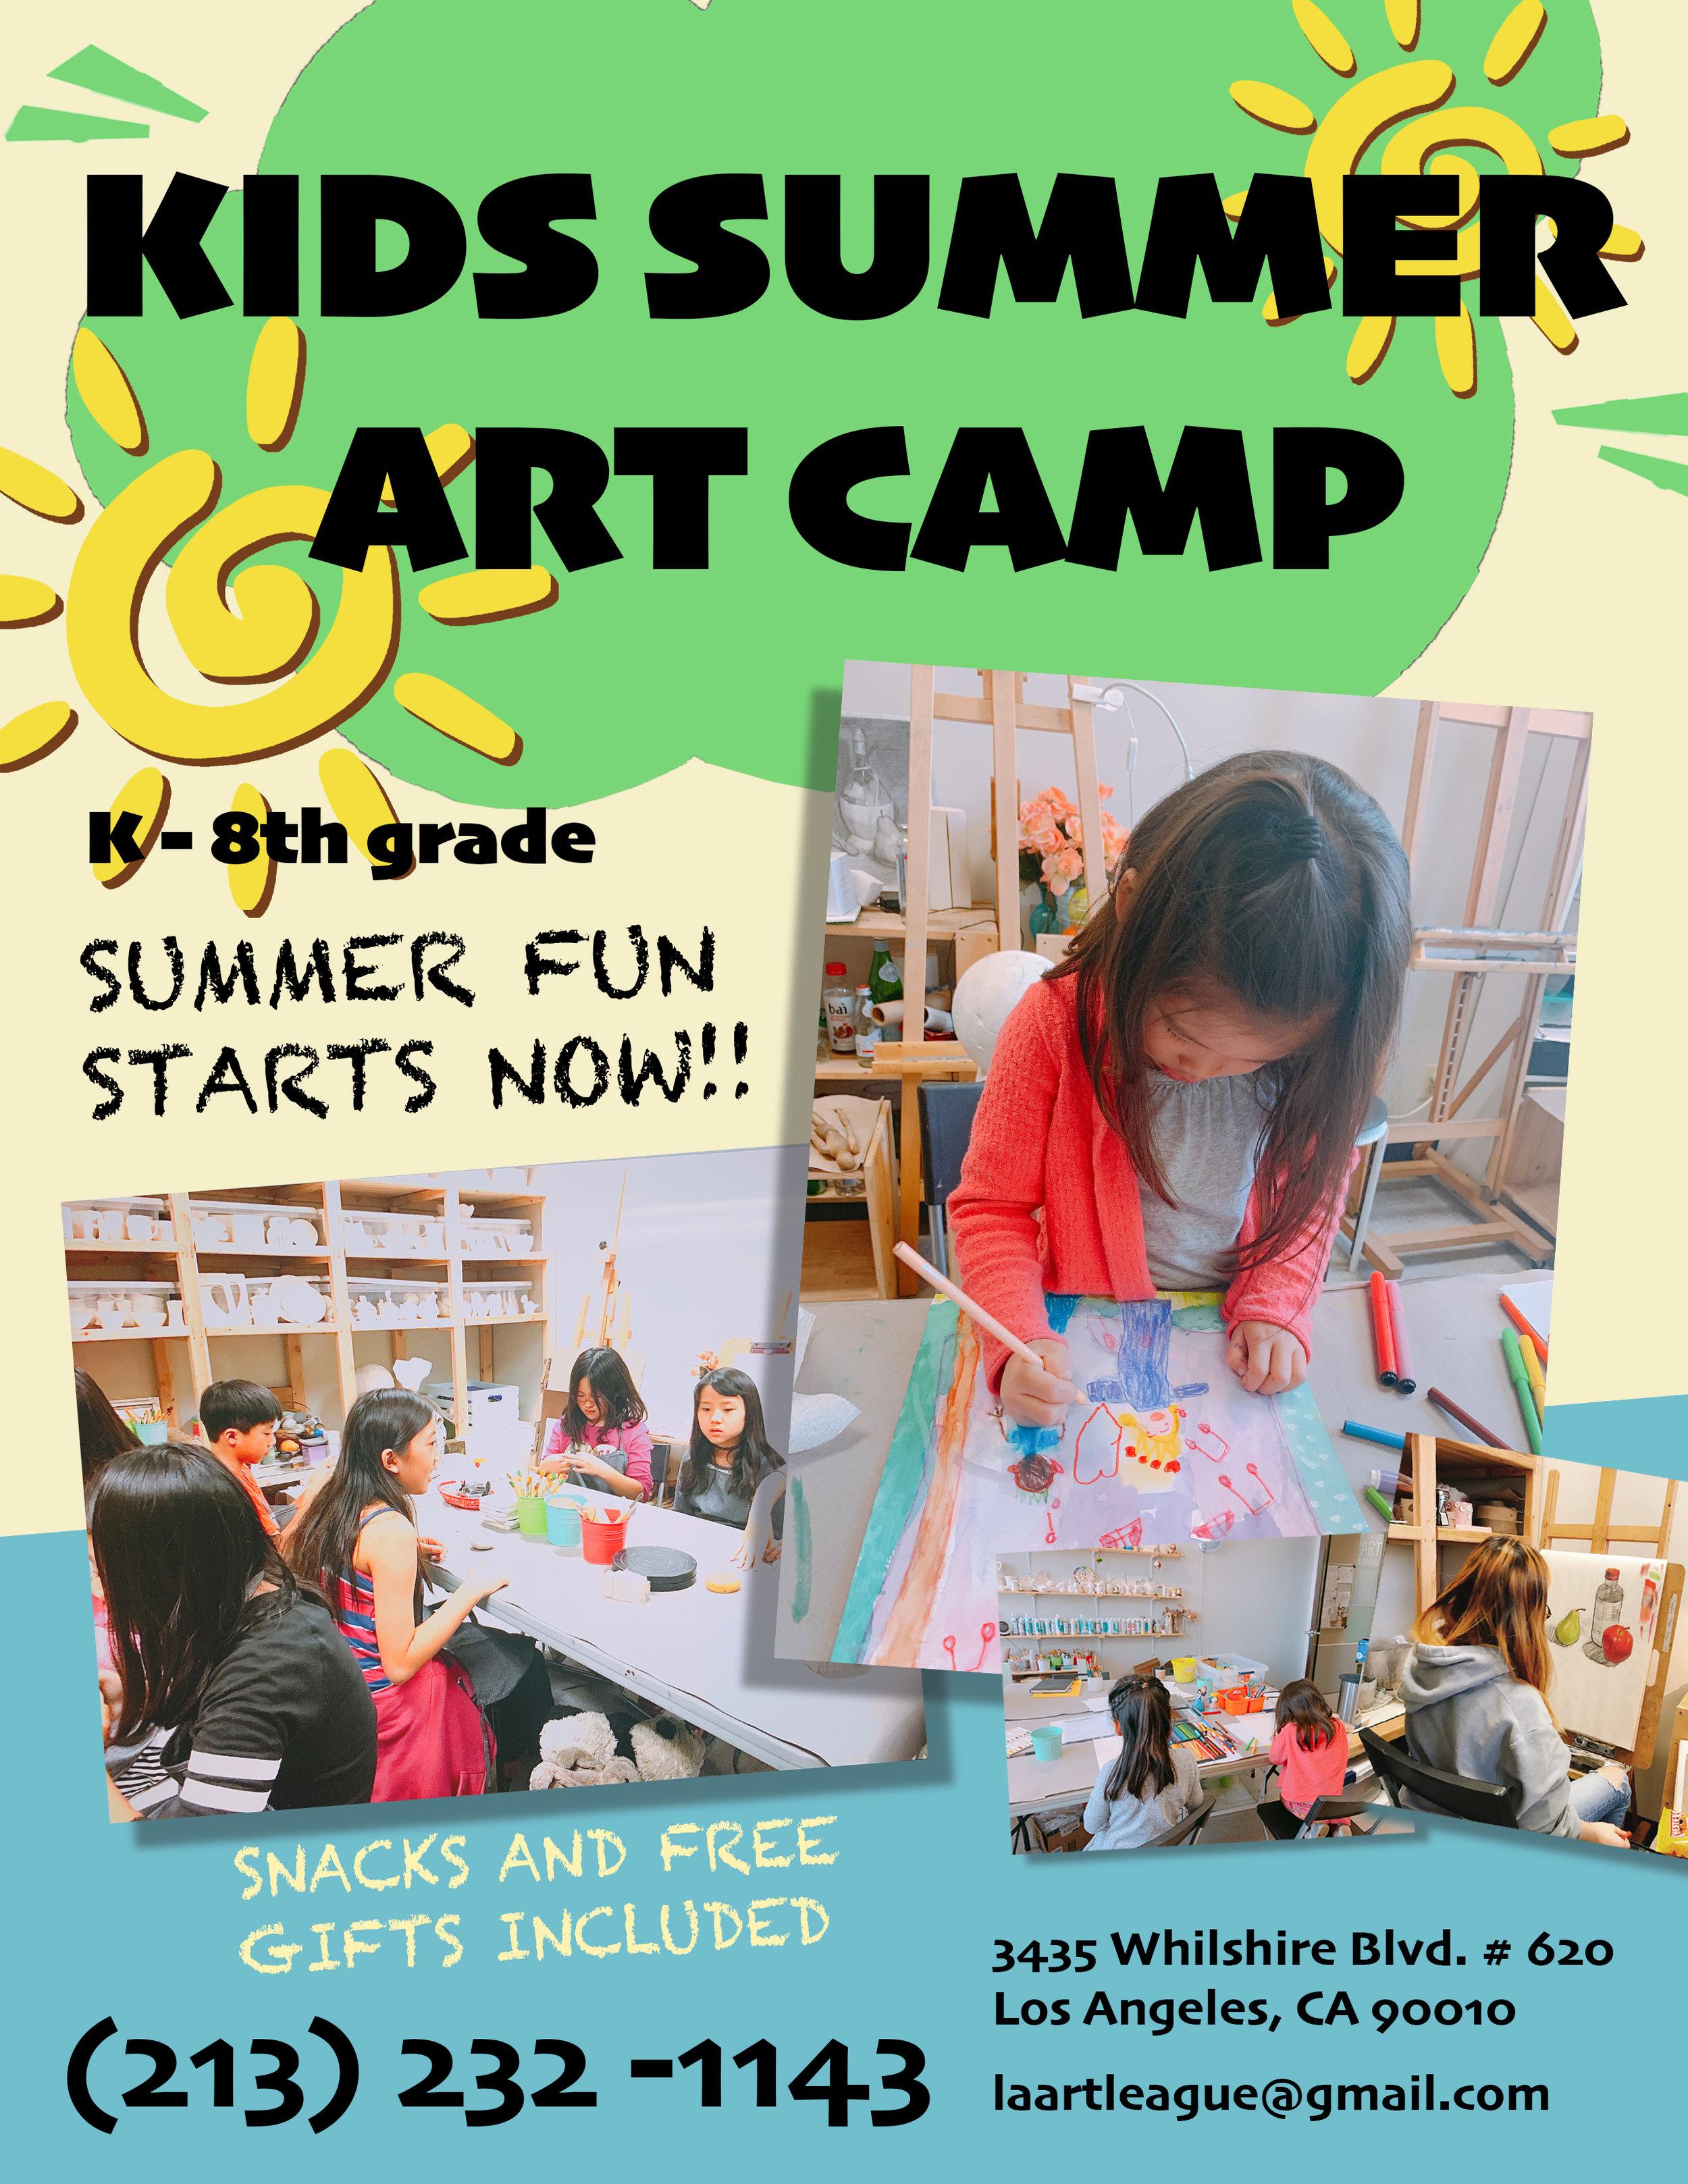 kidssummercamp.jpg